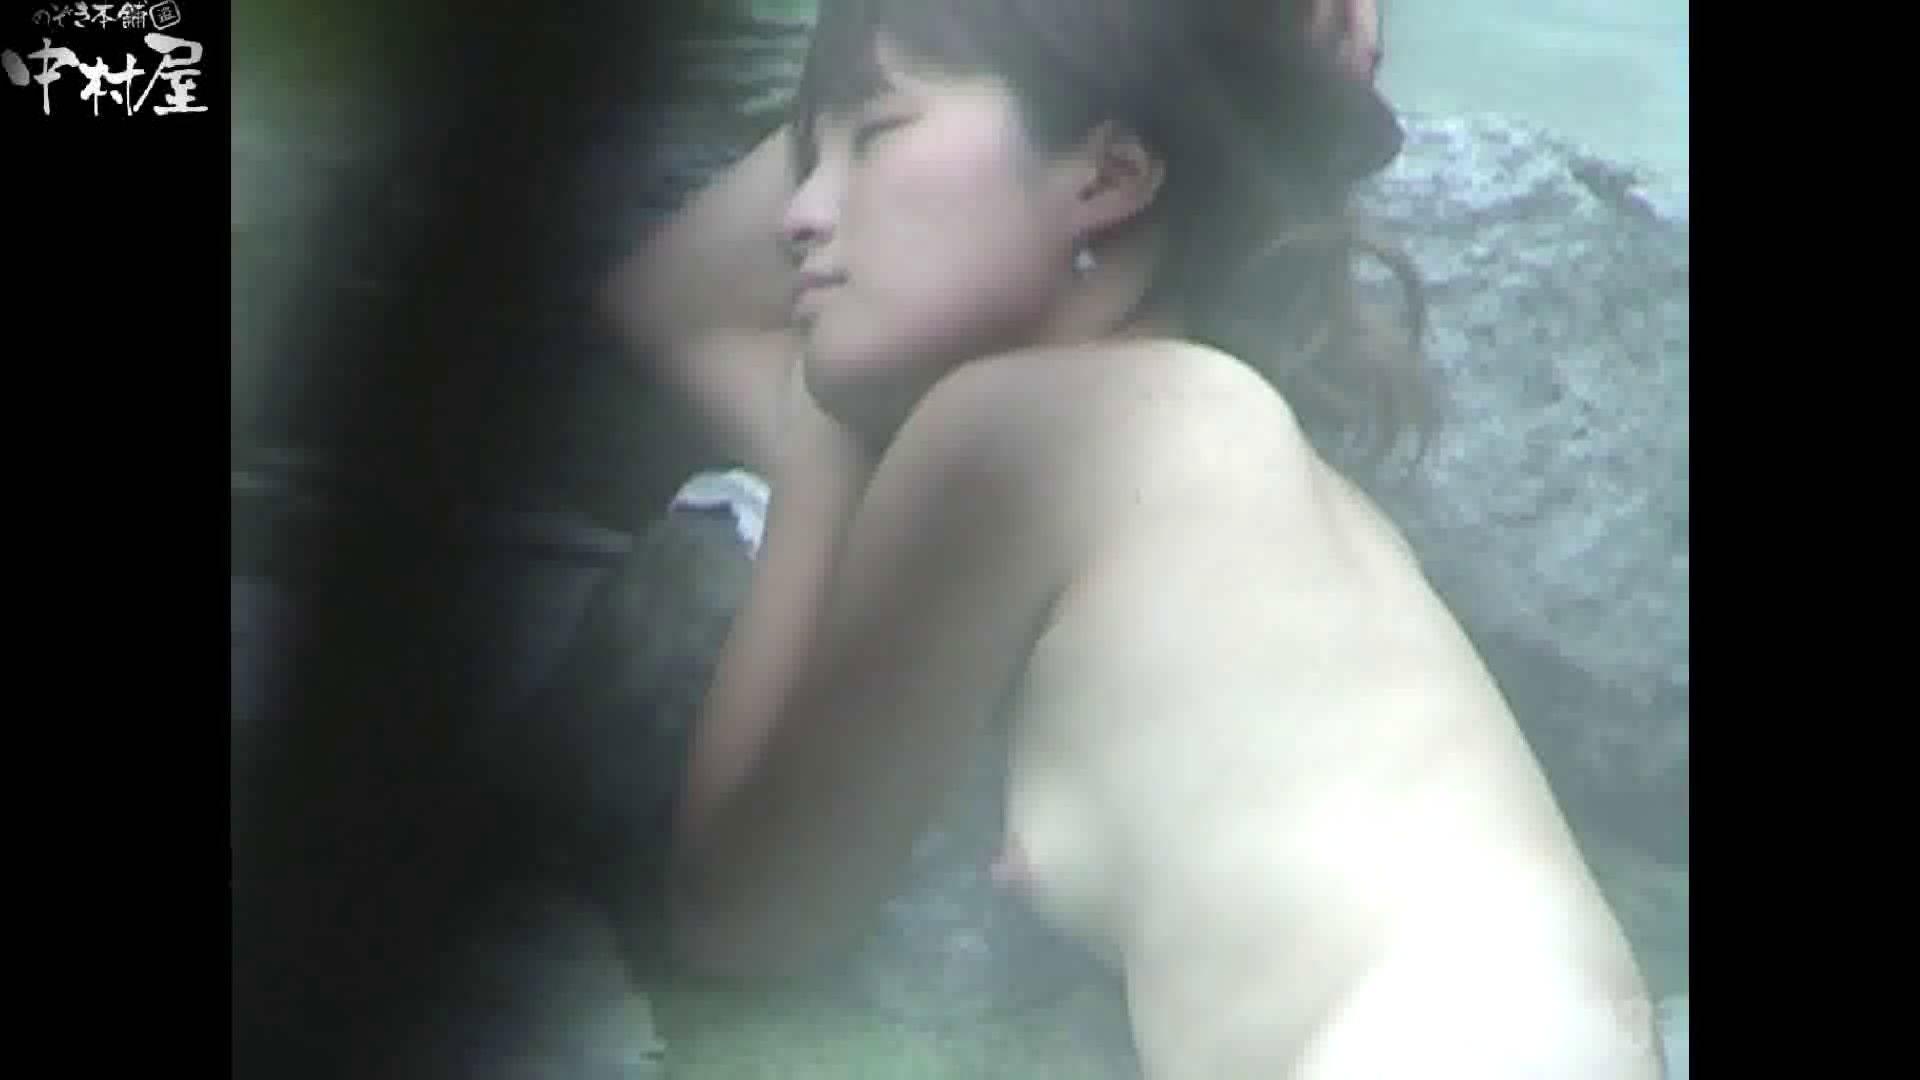 Aquaな露天風呂Vol.867潜入盗撮露天風呂参判湯 其の一 美しいOLの裸体  99pic 84